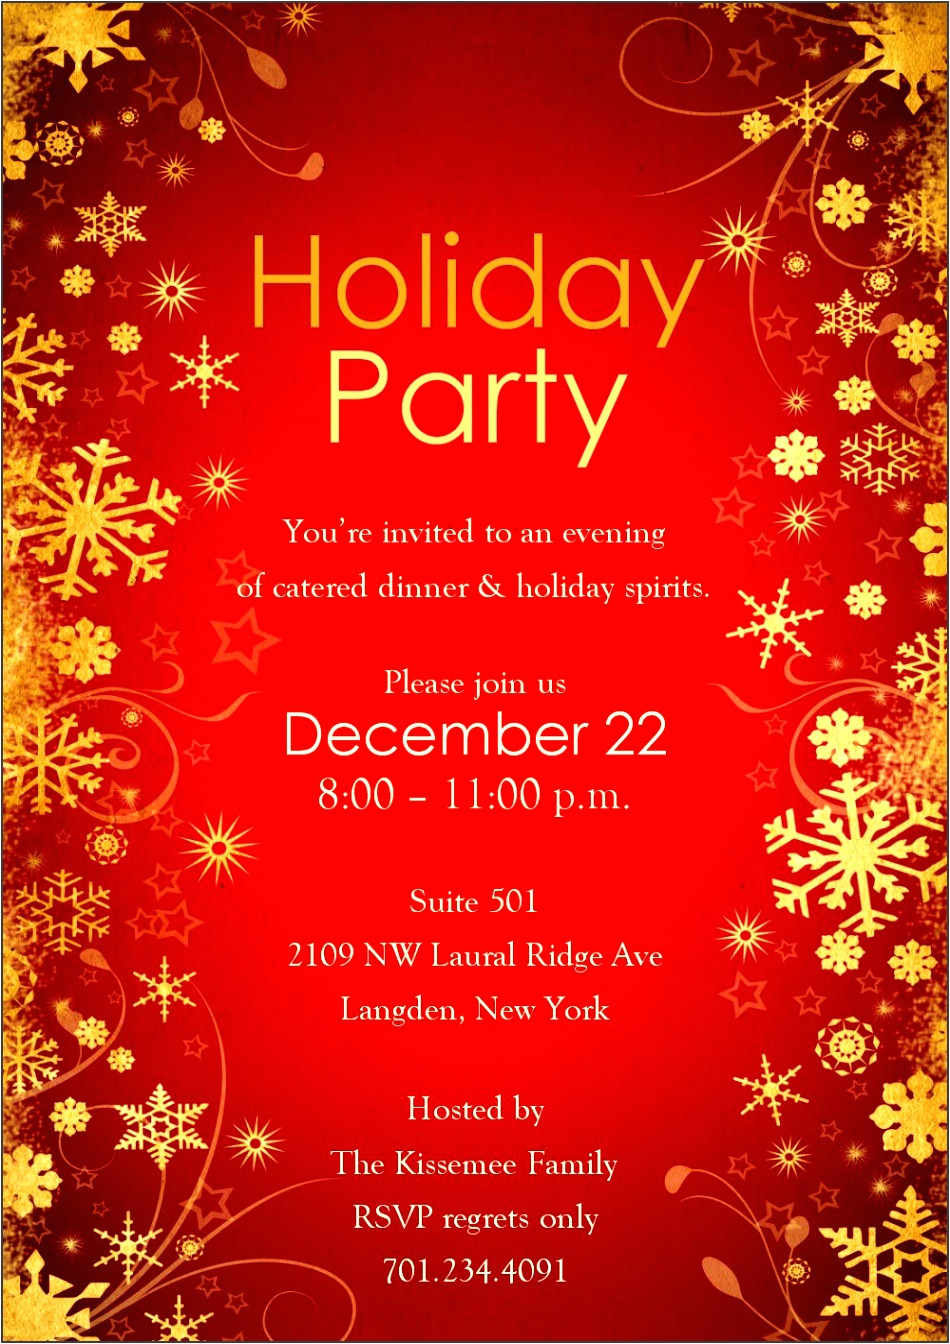 ms word birthday party invitation template shpej